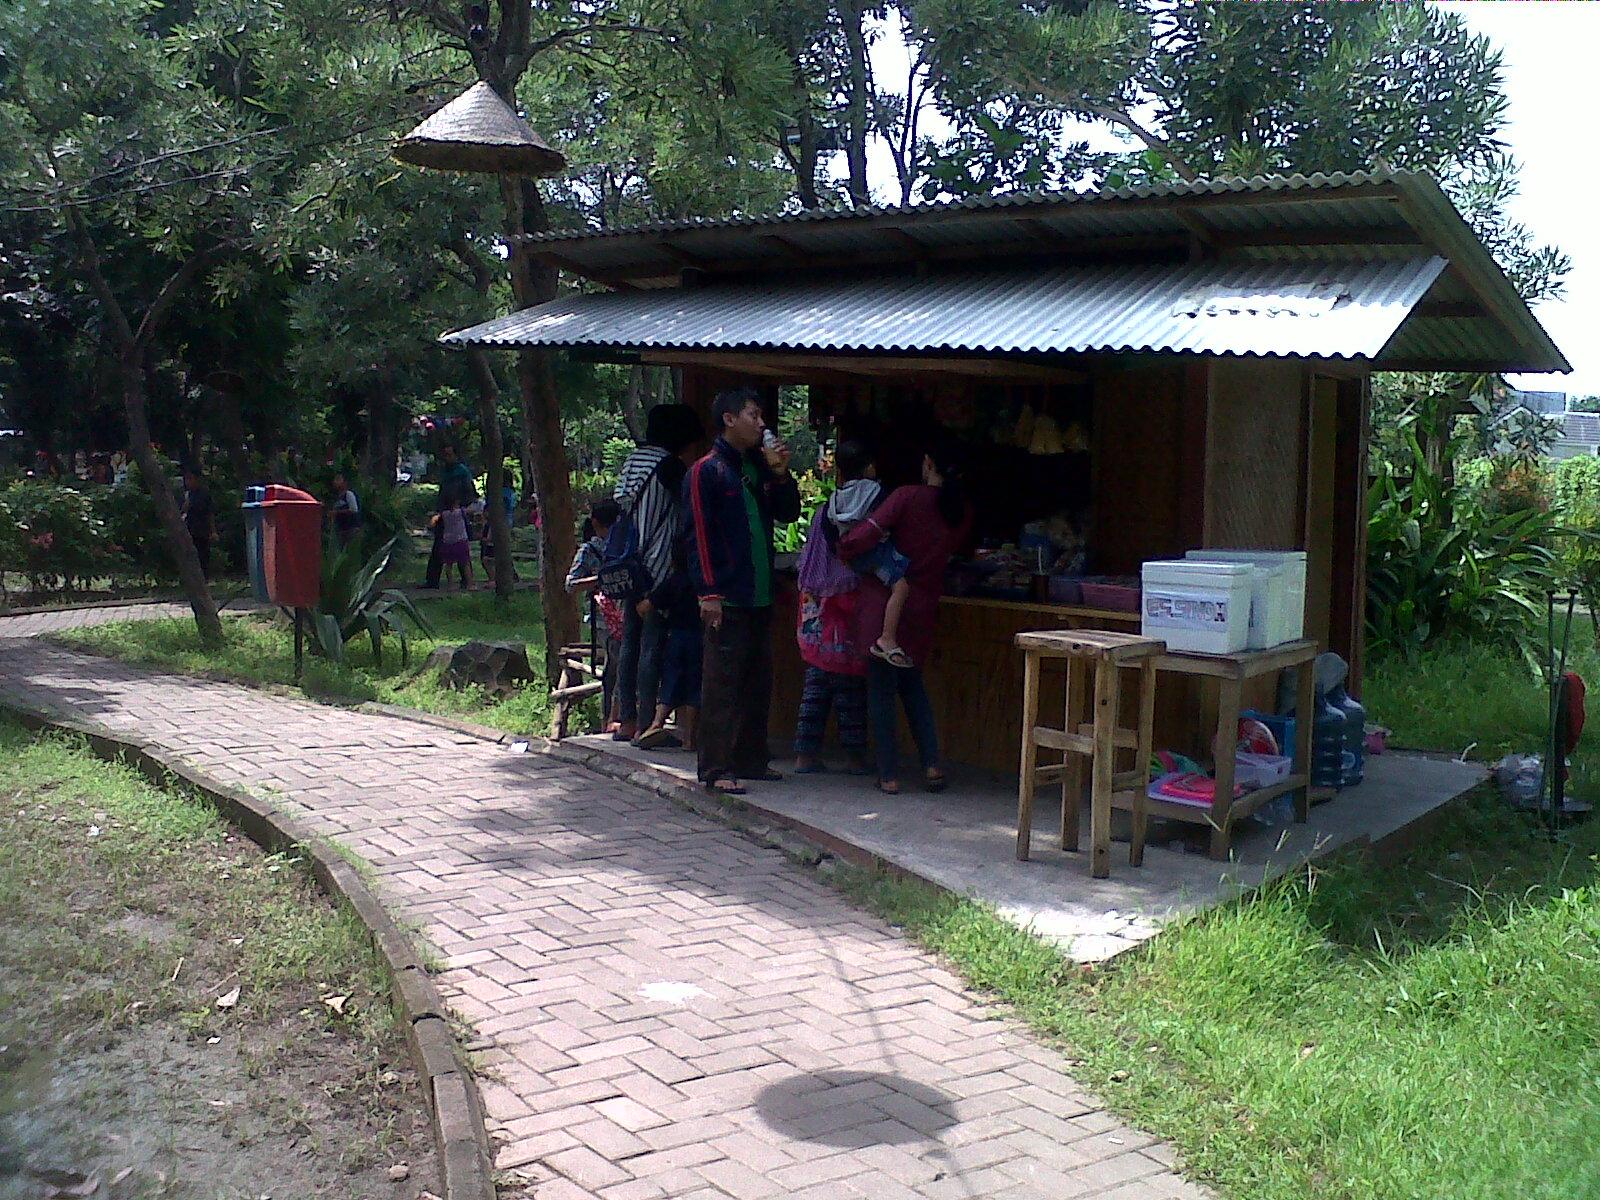 Review Wisata Taman Abhirama Sidoarjo Disana Mini Warung Haha Jual